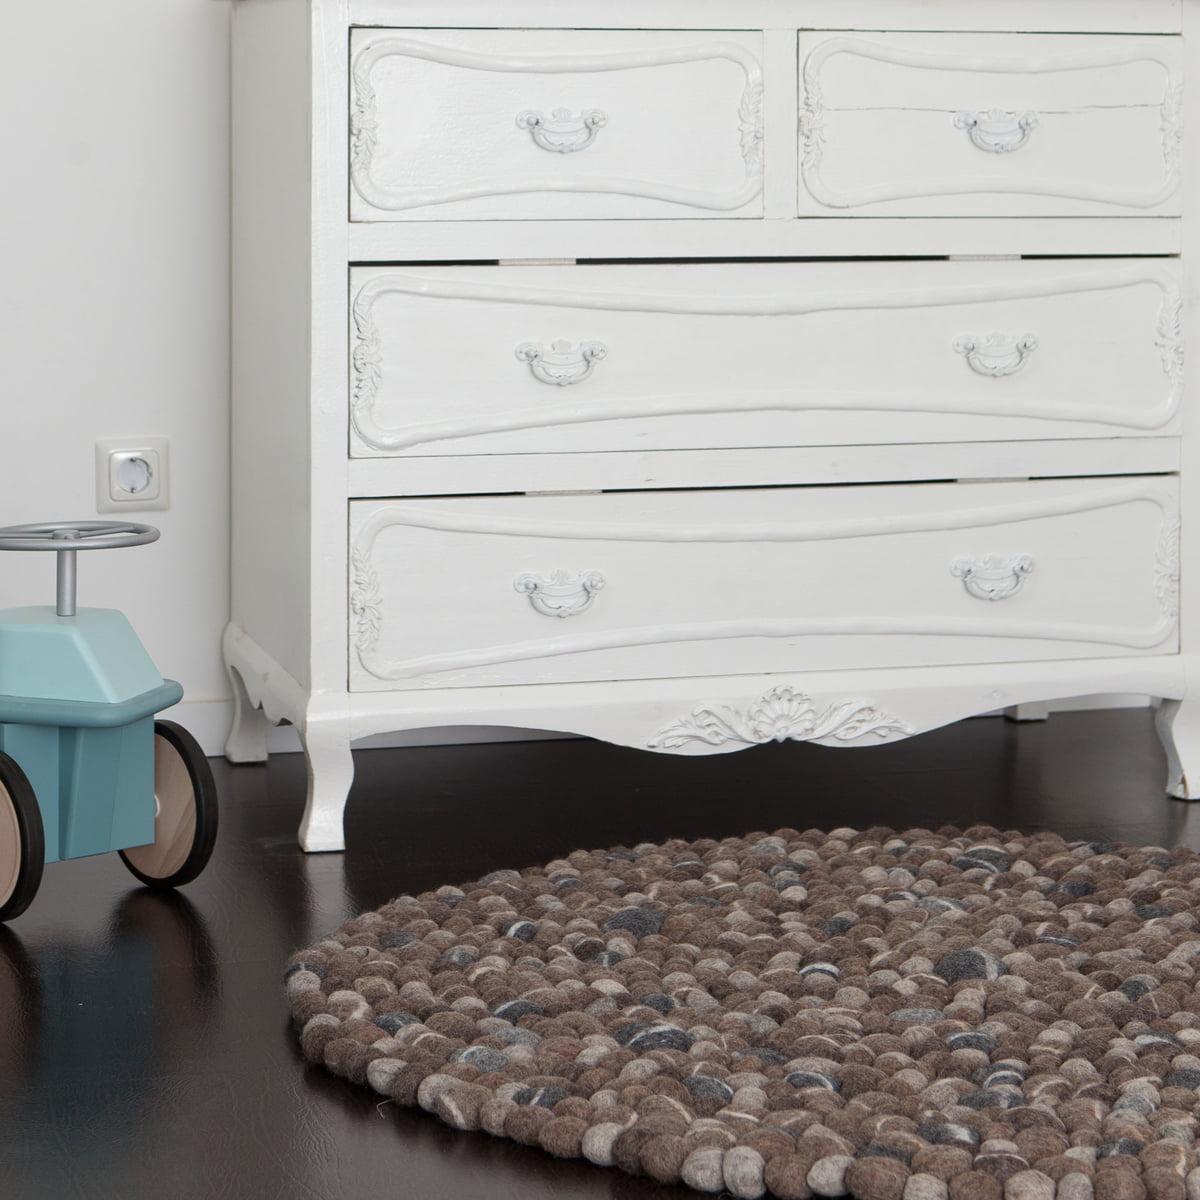 teppich kugeln latest cheap filzkugel teppich selber machen elegant teppich filz teppich. Black Bedroom Furniture Sets. Home Design Ideas